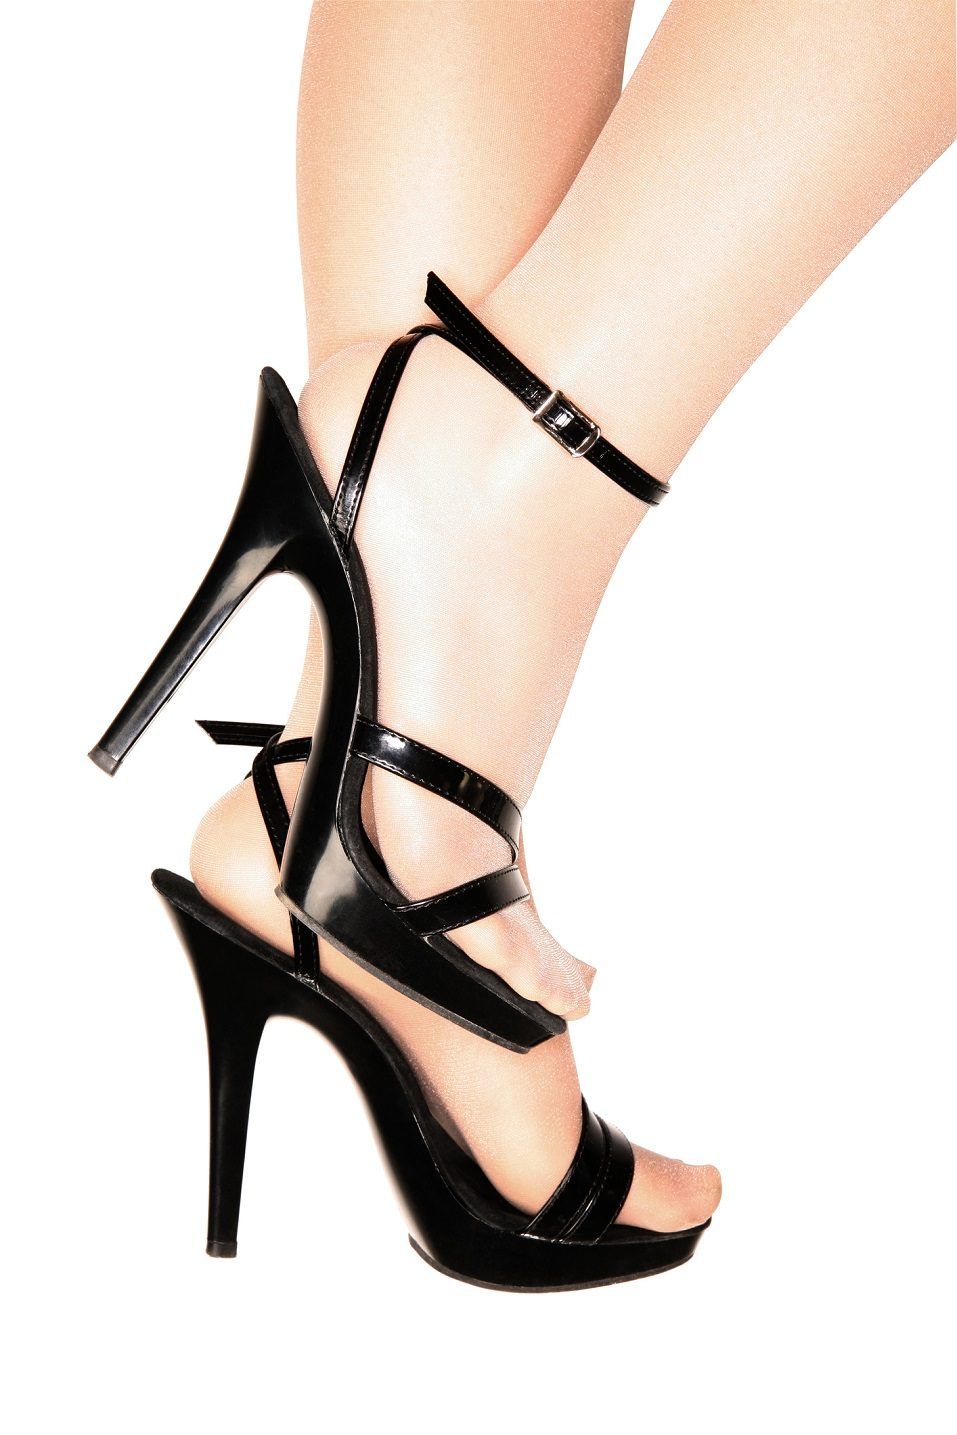 strapped black patent leather high heel stilettos